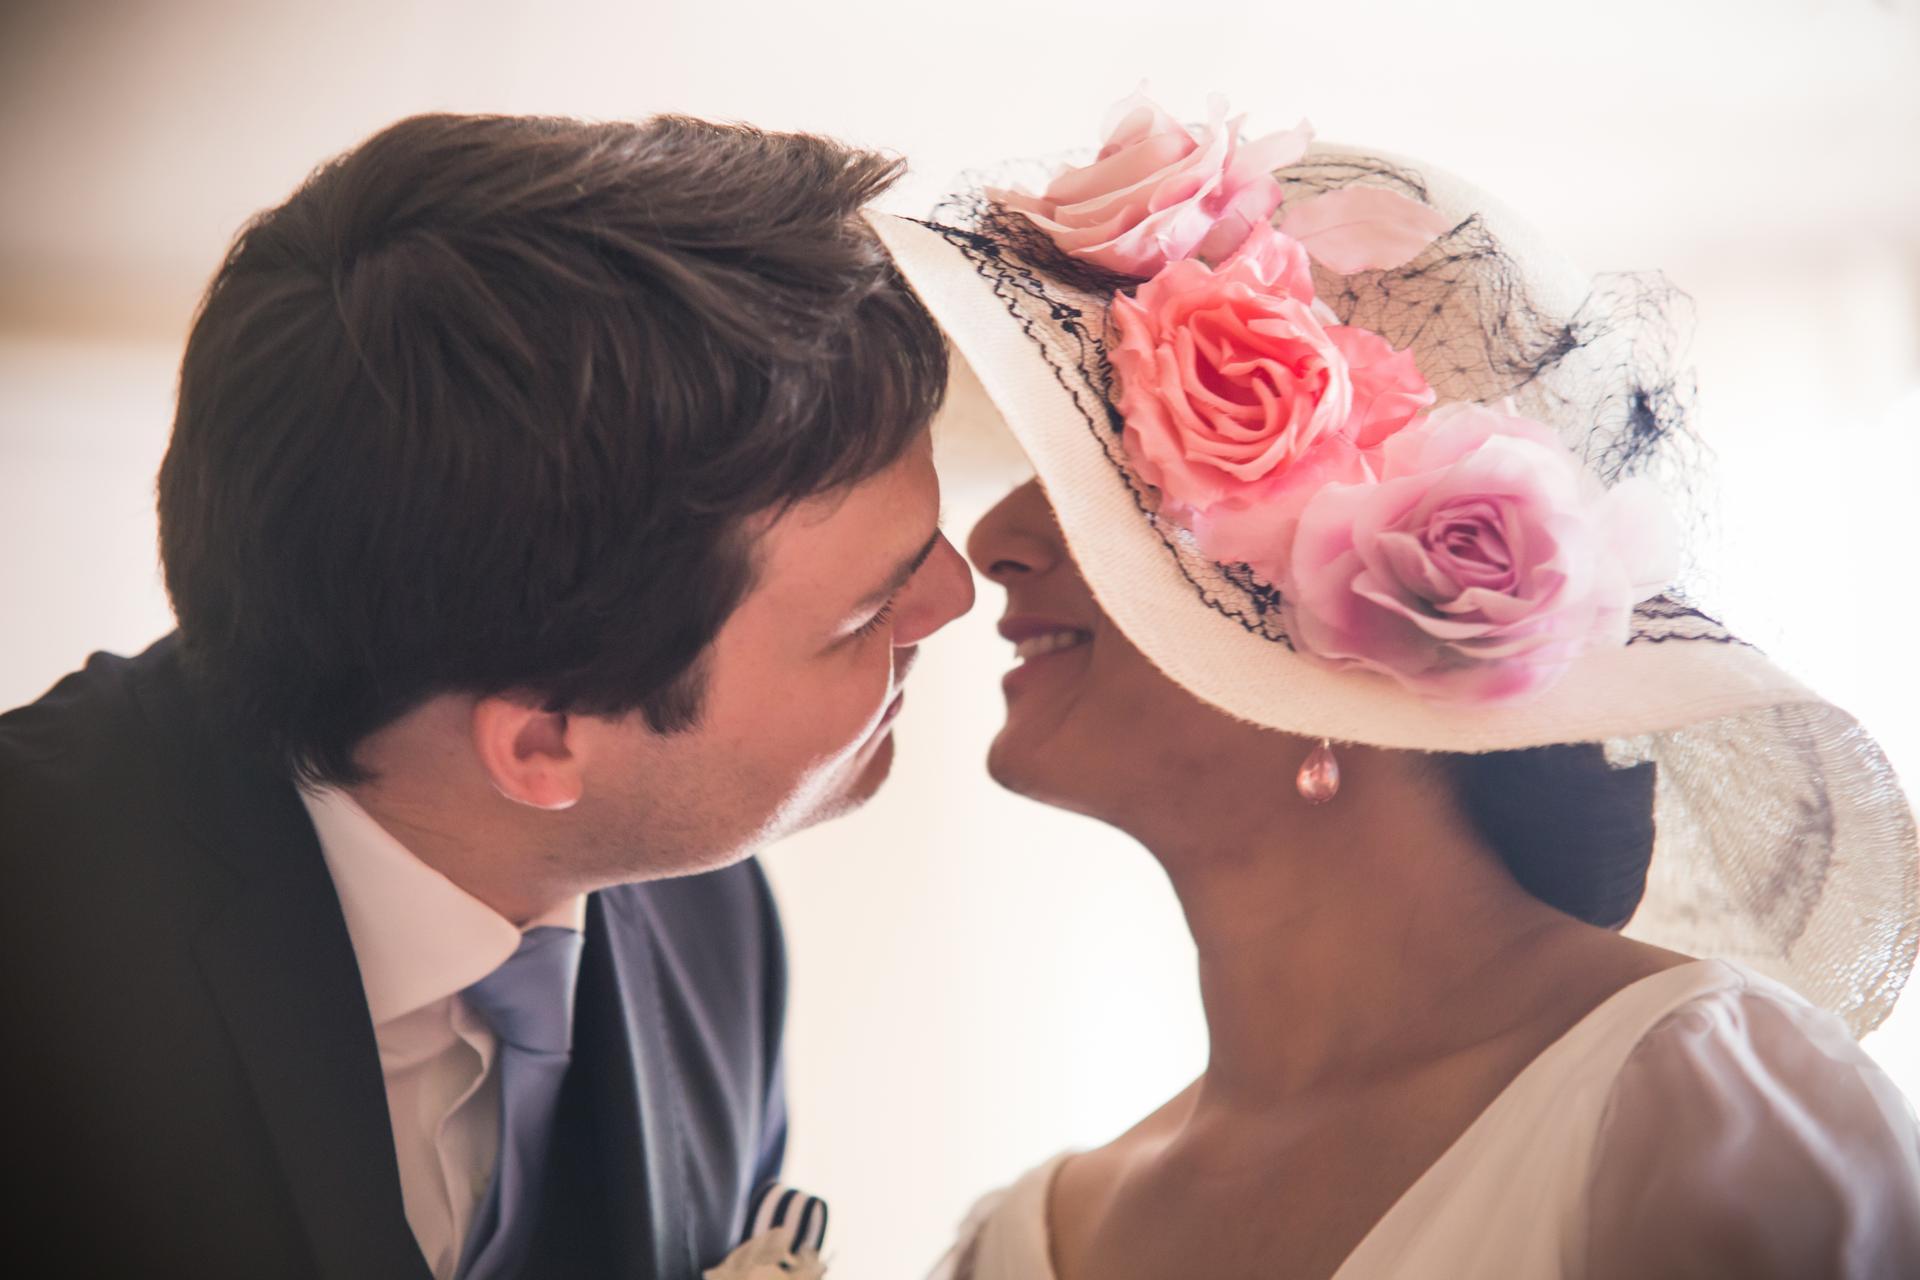 Mariage en Bretagne - Mariage à Saint Malo - Mariage à l'anglaise - Mariage navy - Mariage rose - Les crâneuses - Wedding planner - Wedding designer